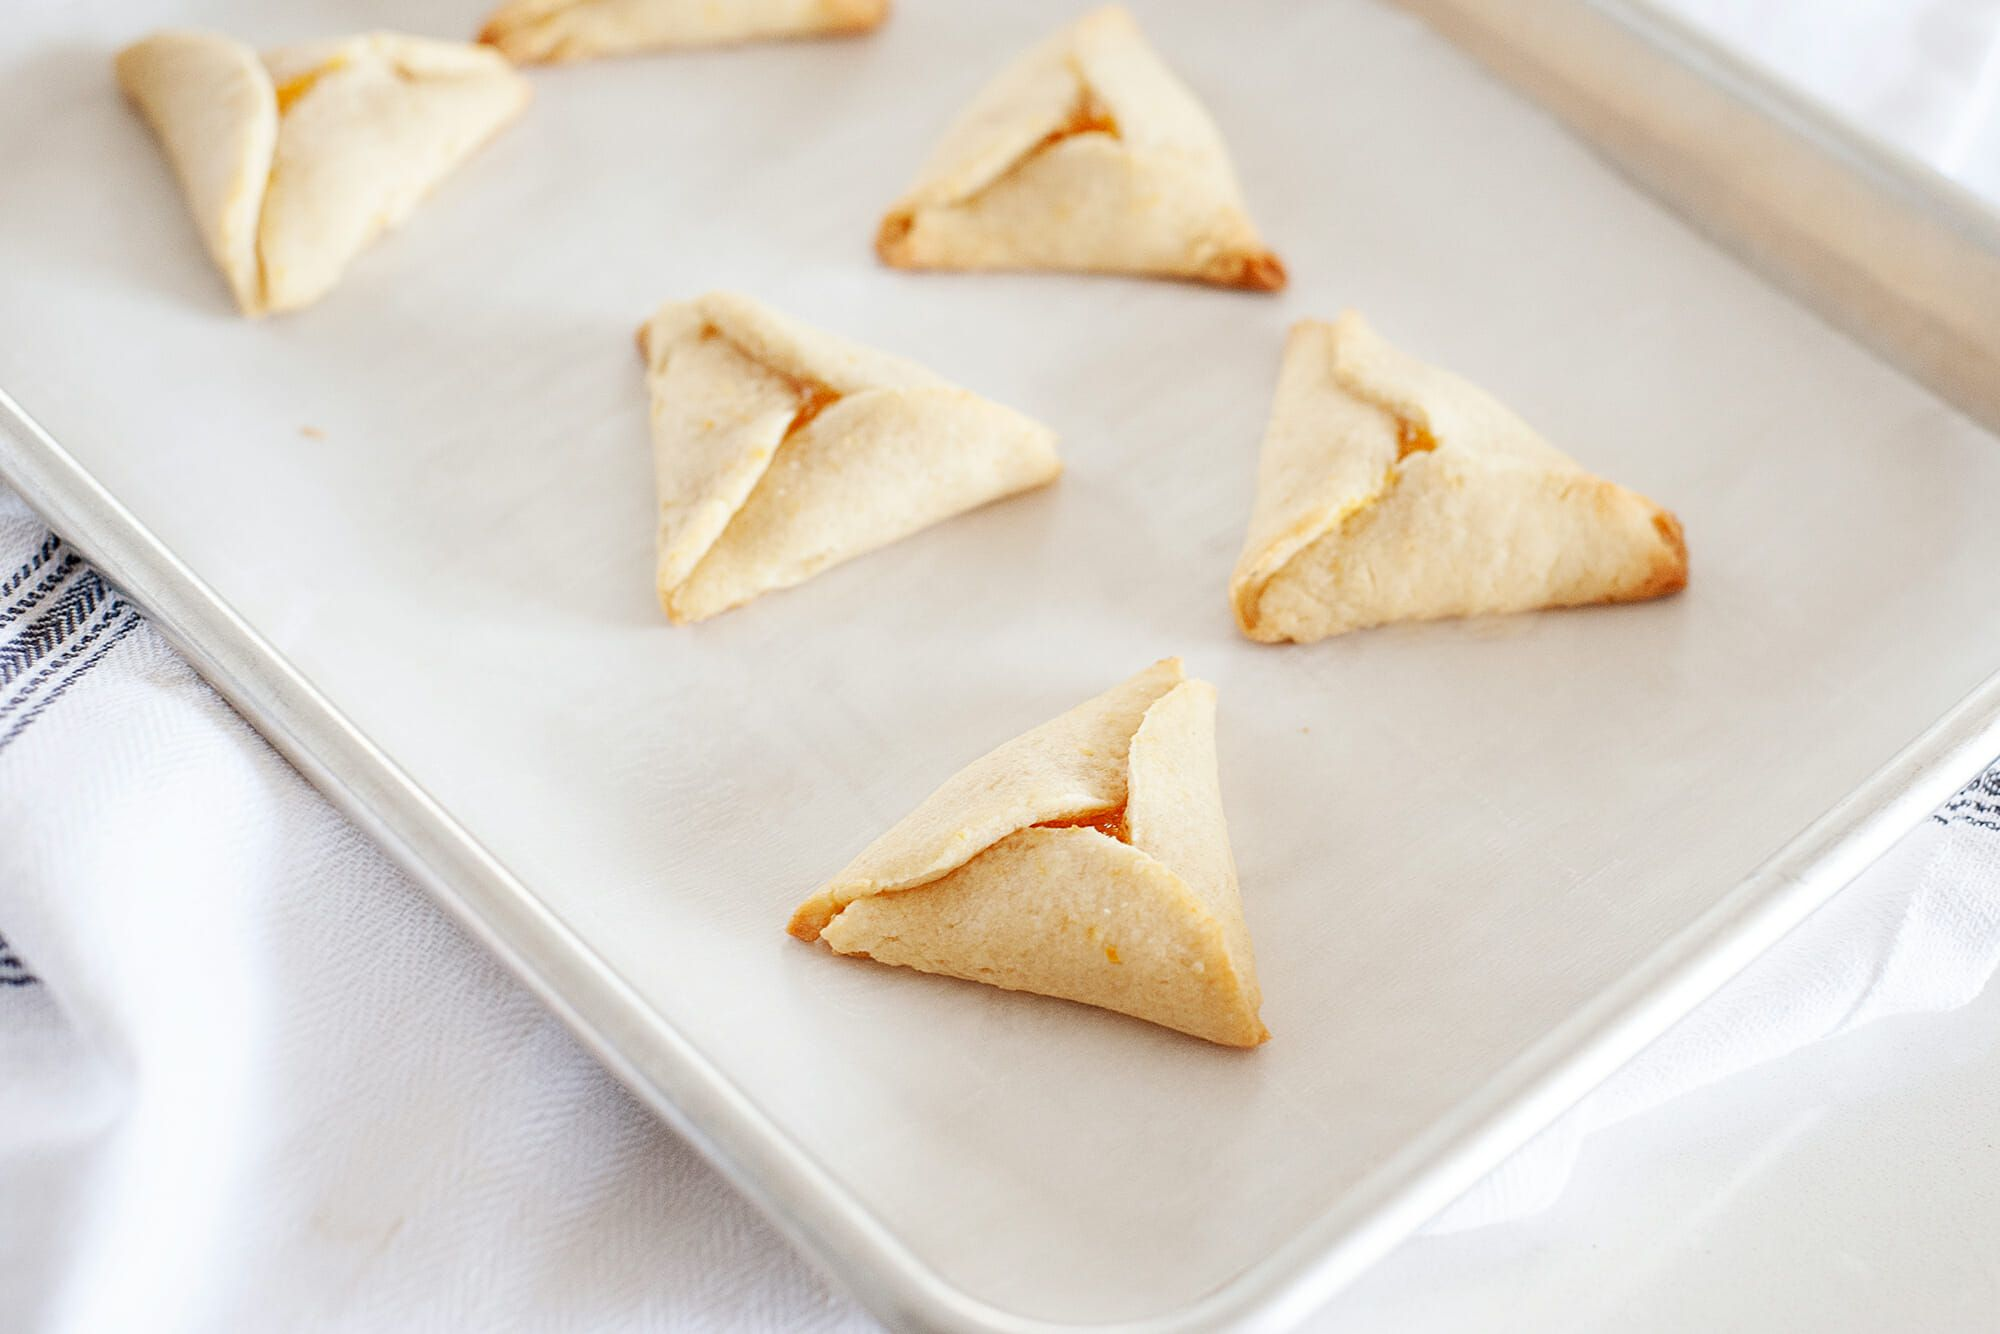 Apricot Hamantaschen set on a diagonal baking sheet with a white linen underneath.